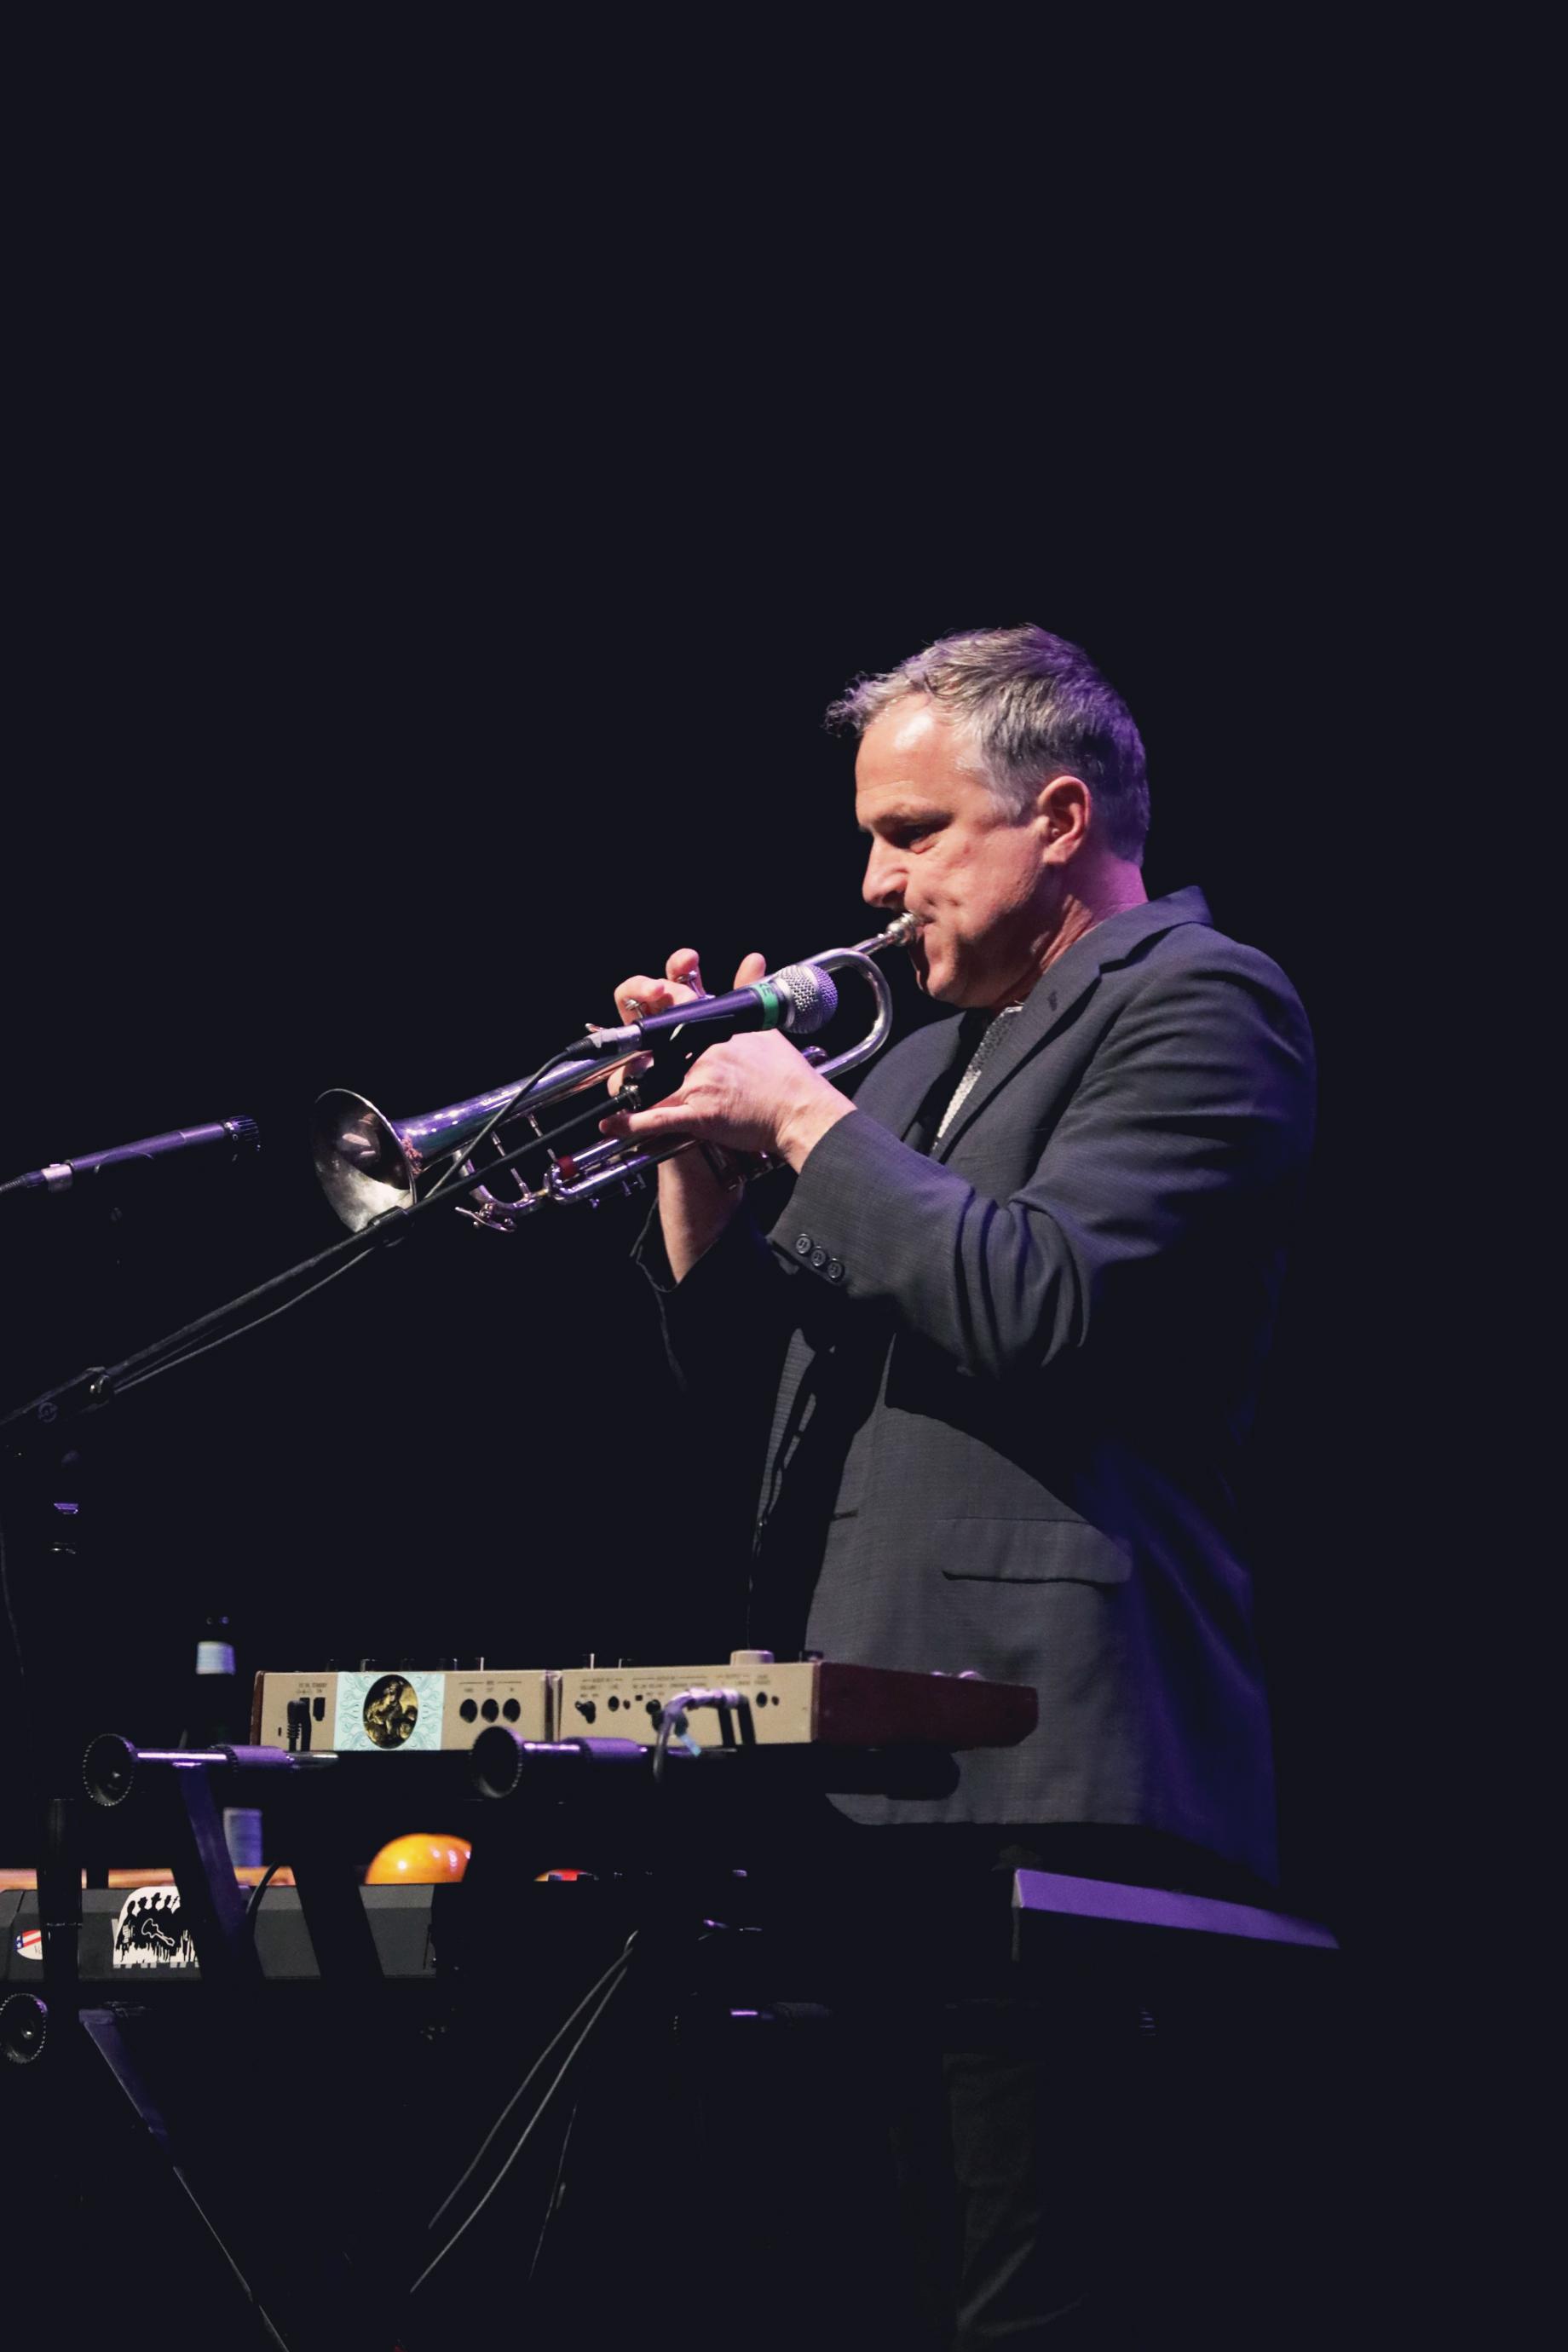 Vince DiFiore. Photo: Lmsorenson.net